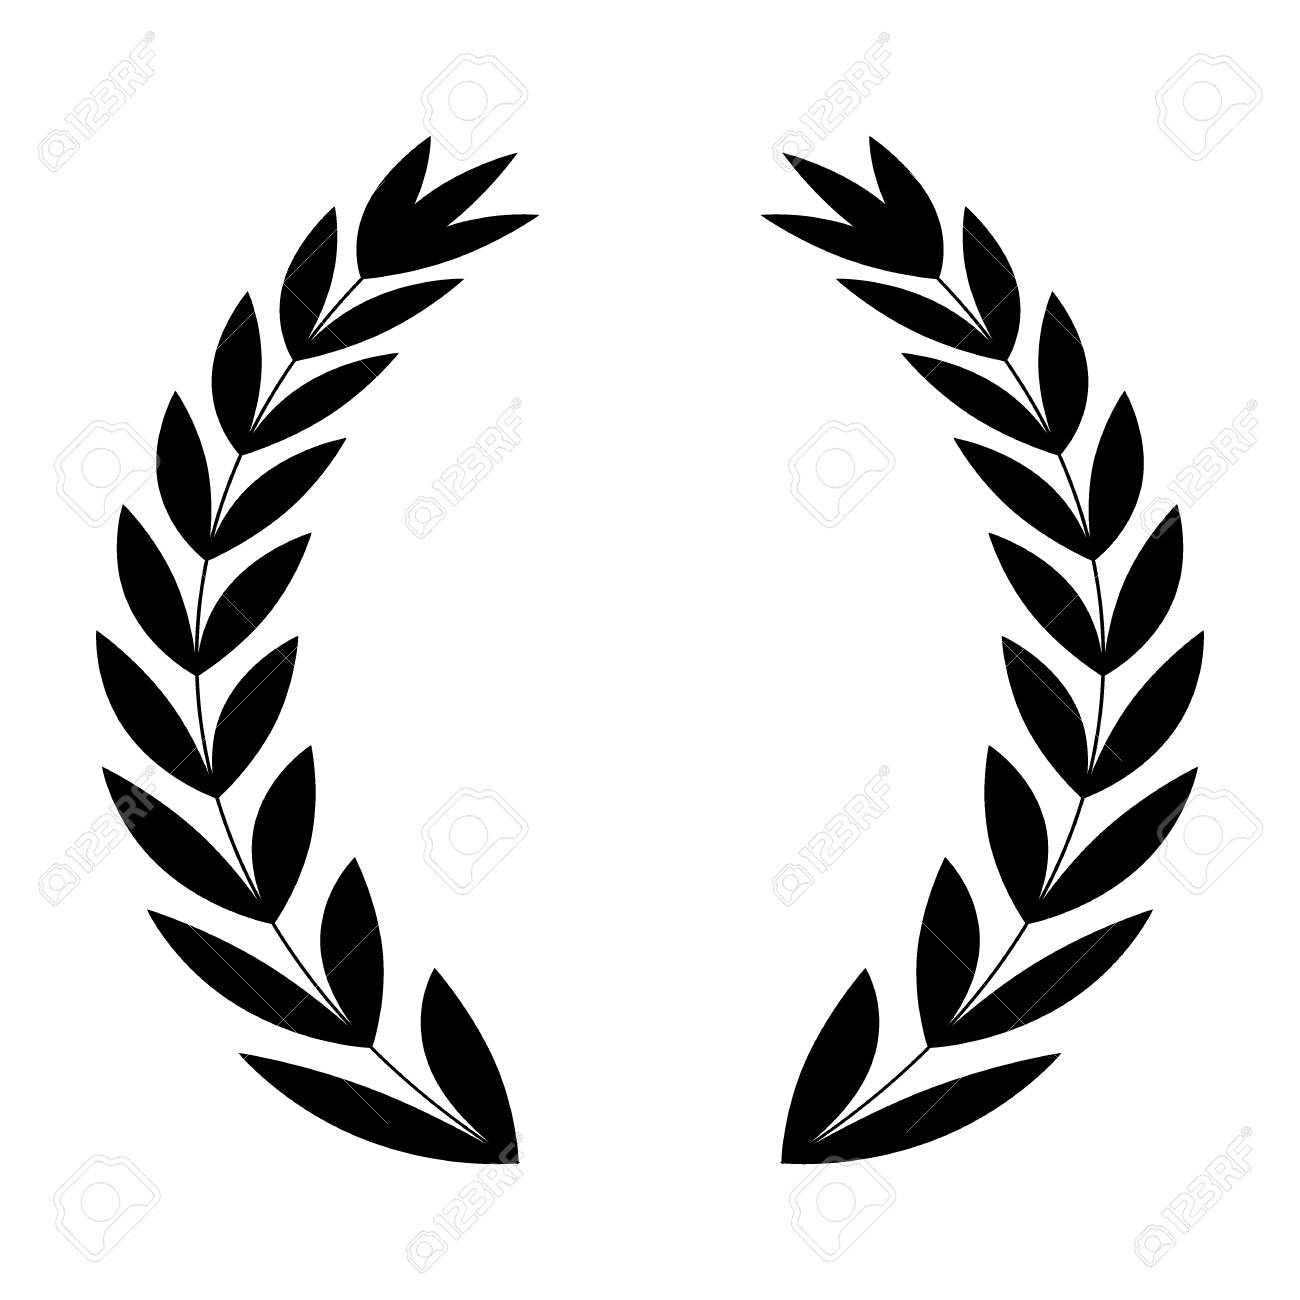 wreath leaves ornament icon icon vector illustration graphic